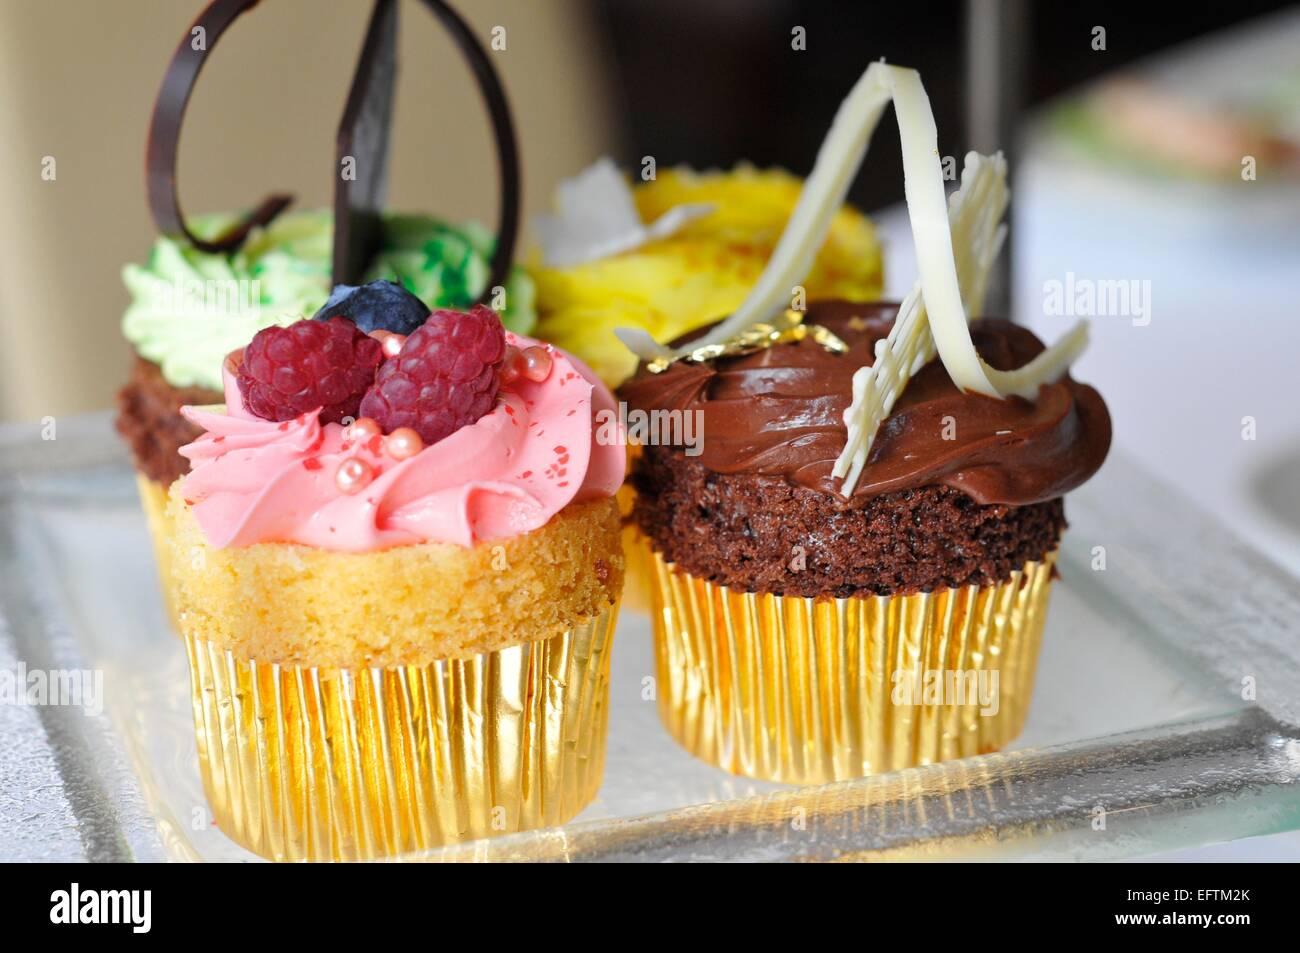 Afternoon Tea Cakes at The London Hilton, Park Lane, London, England, UK - Stock Image